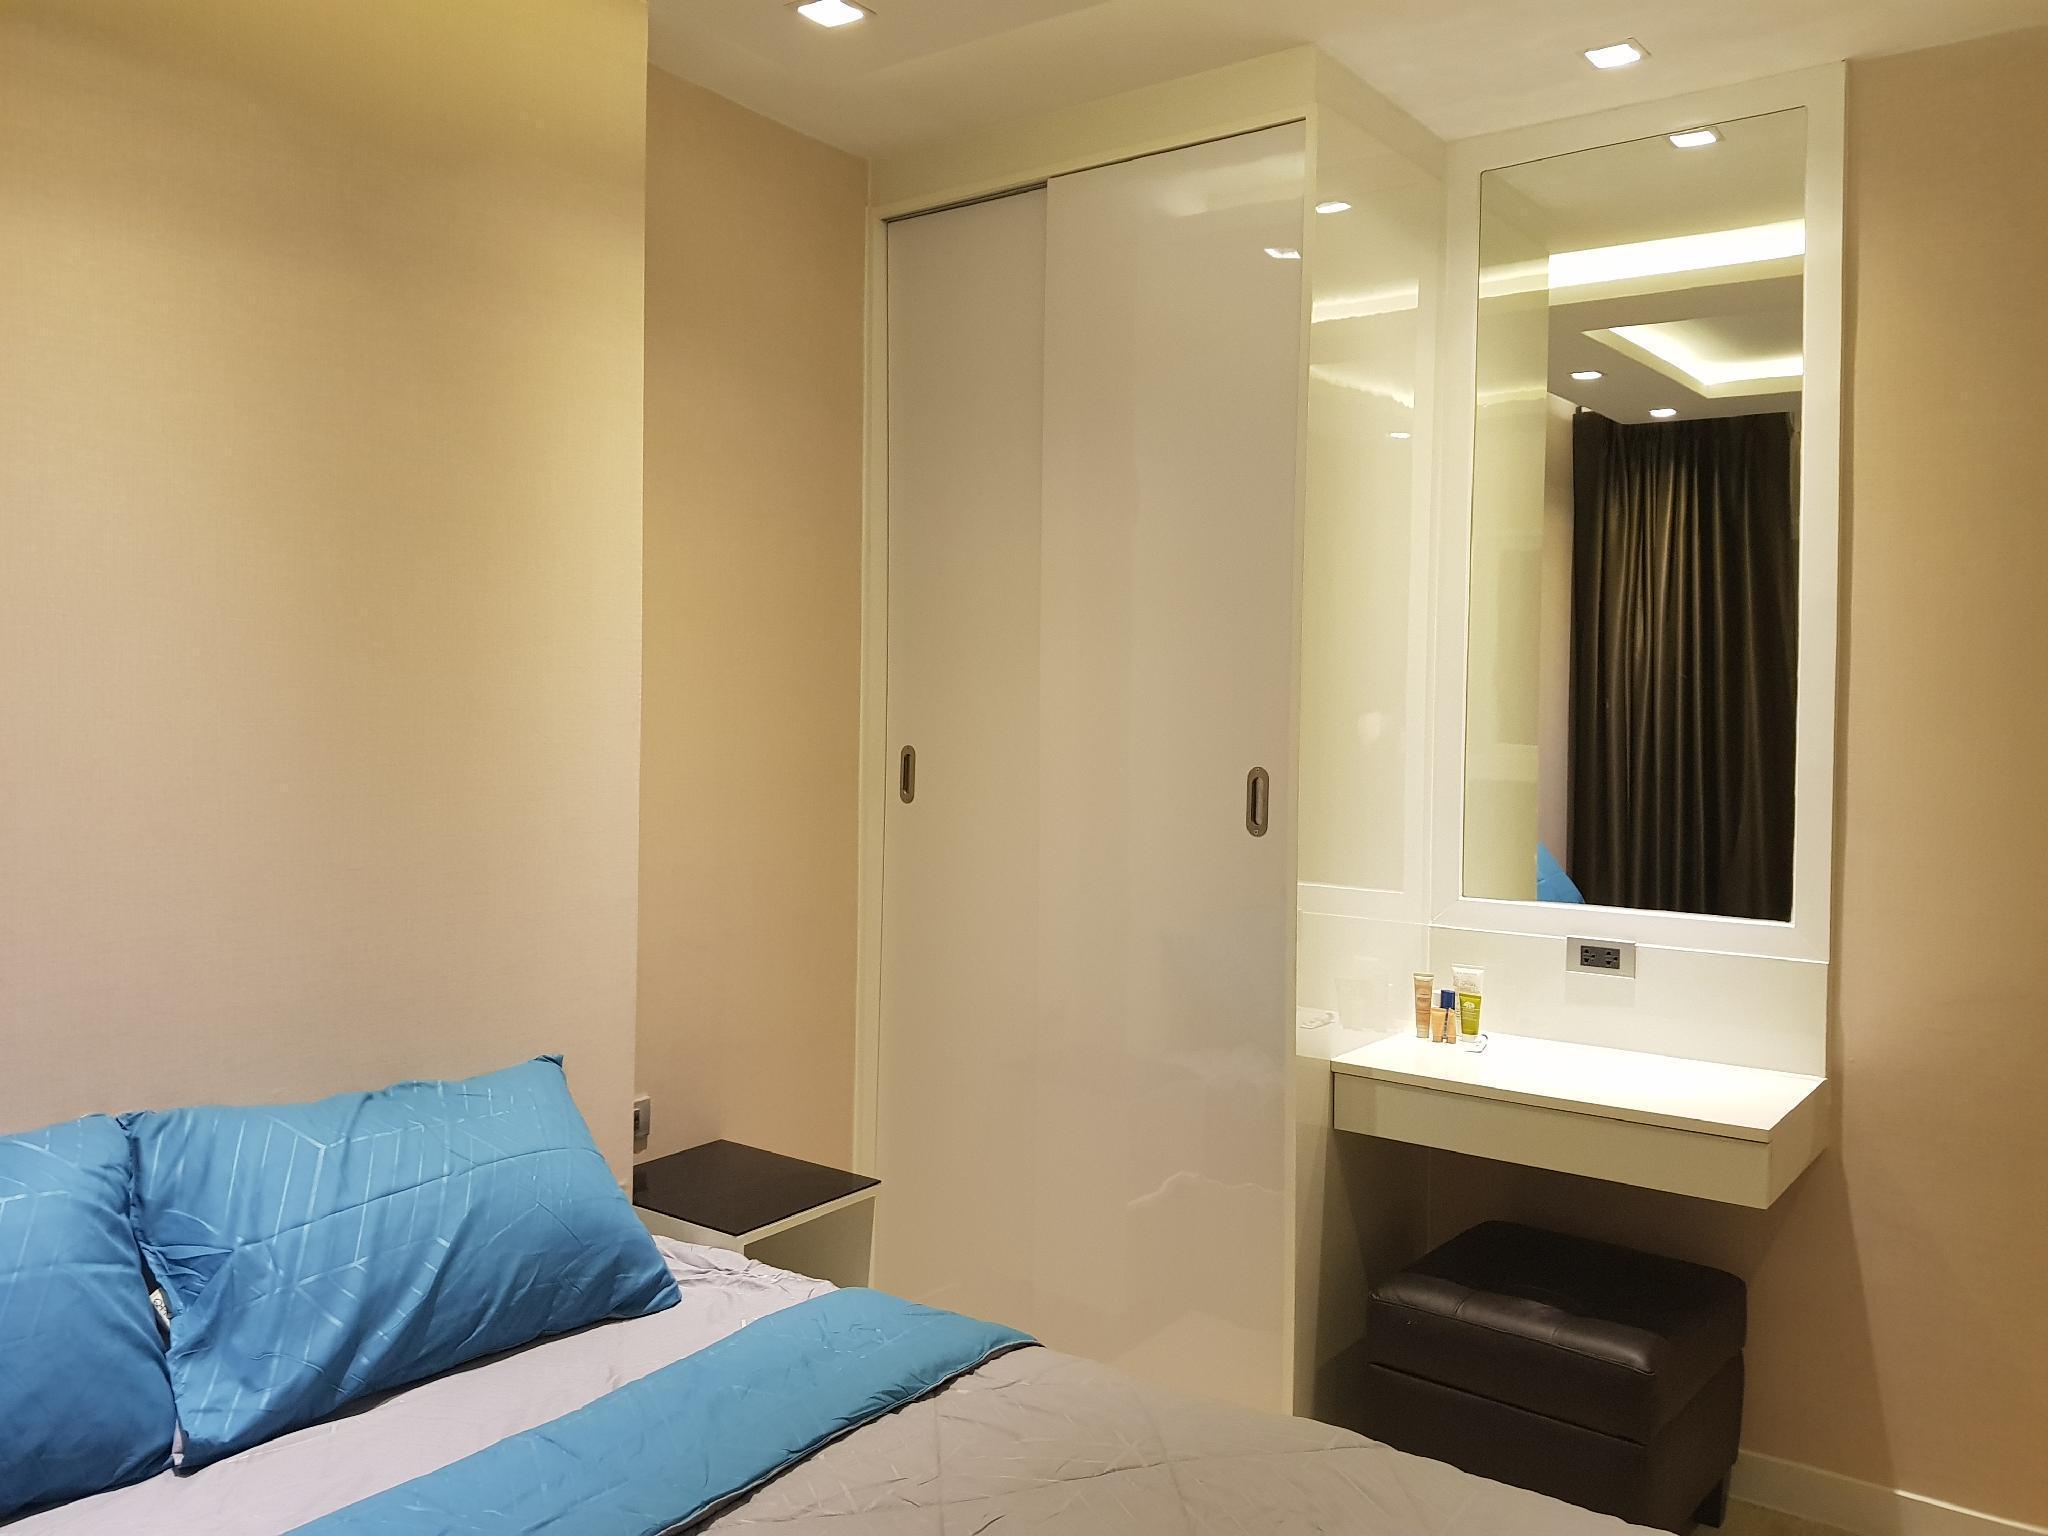 Luxury condo in good locayion in Jomtein beach. อพาร์ตเมนต์ 1 ห้องนอน 1 ห้องน้ำส่วนตัว ขนาด 36 ตร.ม. – หาดจอมเทียน